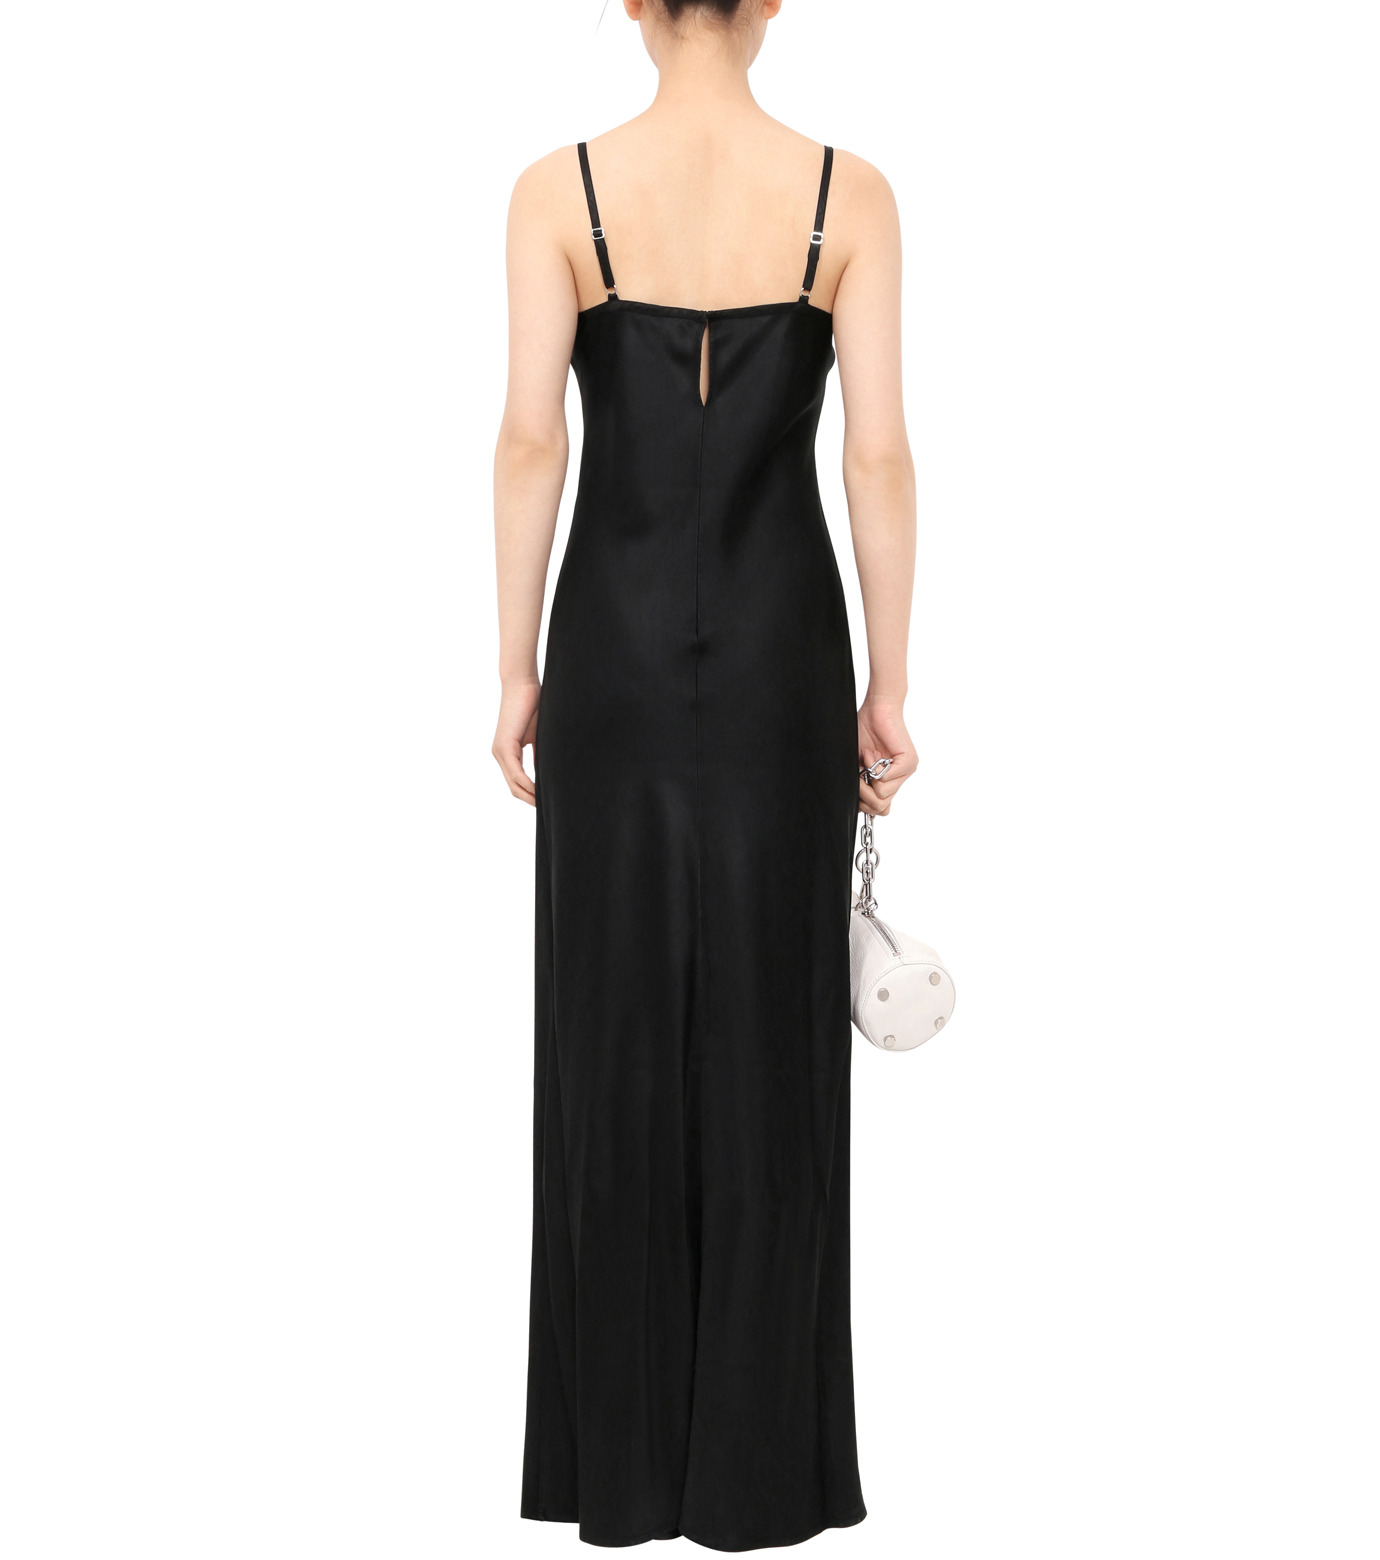 T by Alexander Wang(ティーバイ アレキサンダーワン)のSatin Slip Dress-BLACK(ワンピース/one piece)-403406S16-13 拡大詳細画像2